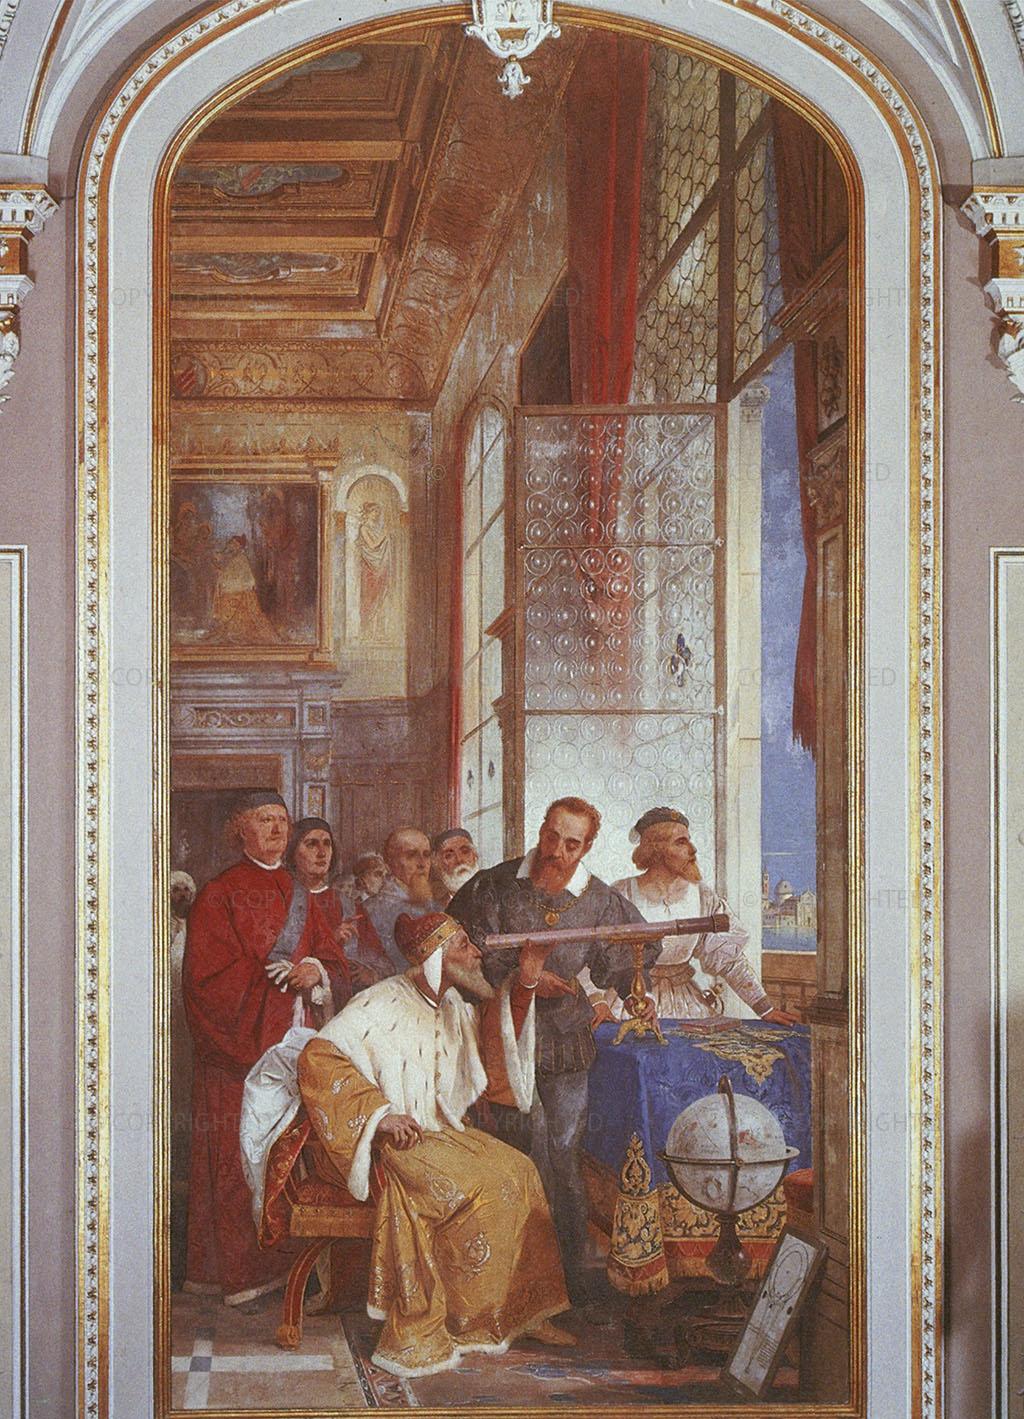 1858, Fresco, cm 491 x 238, Biumo di Varese, Villa Ponti, Hall of Honor